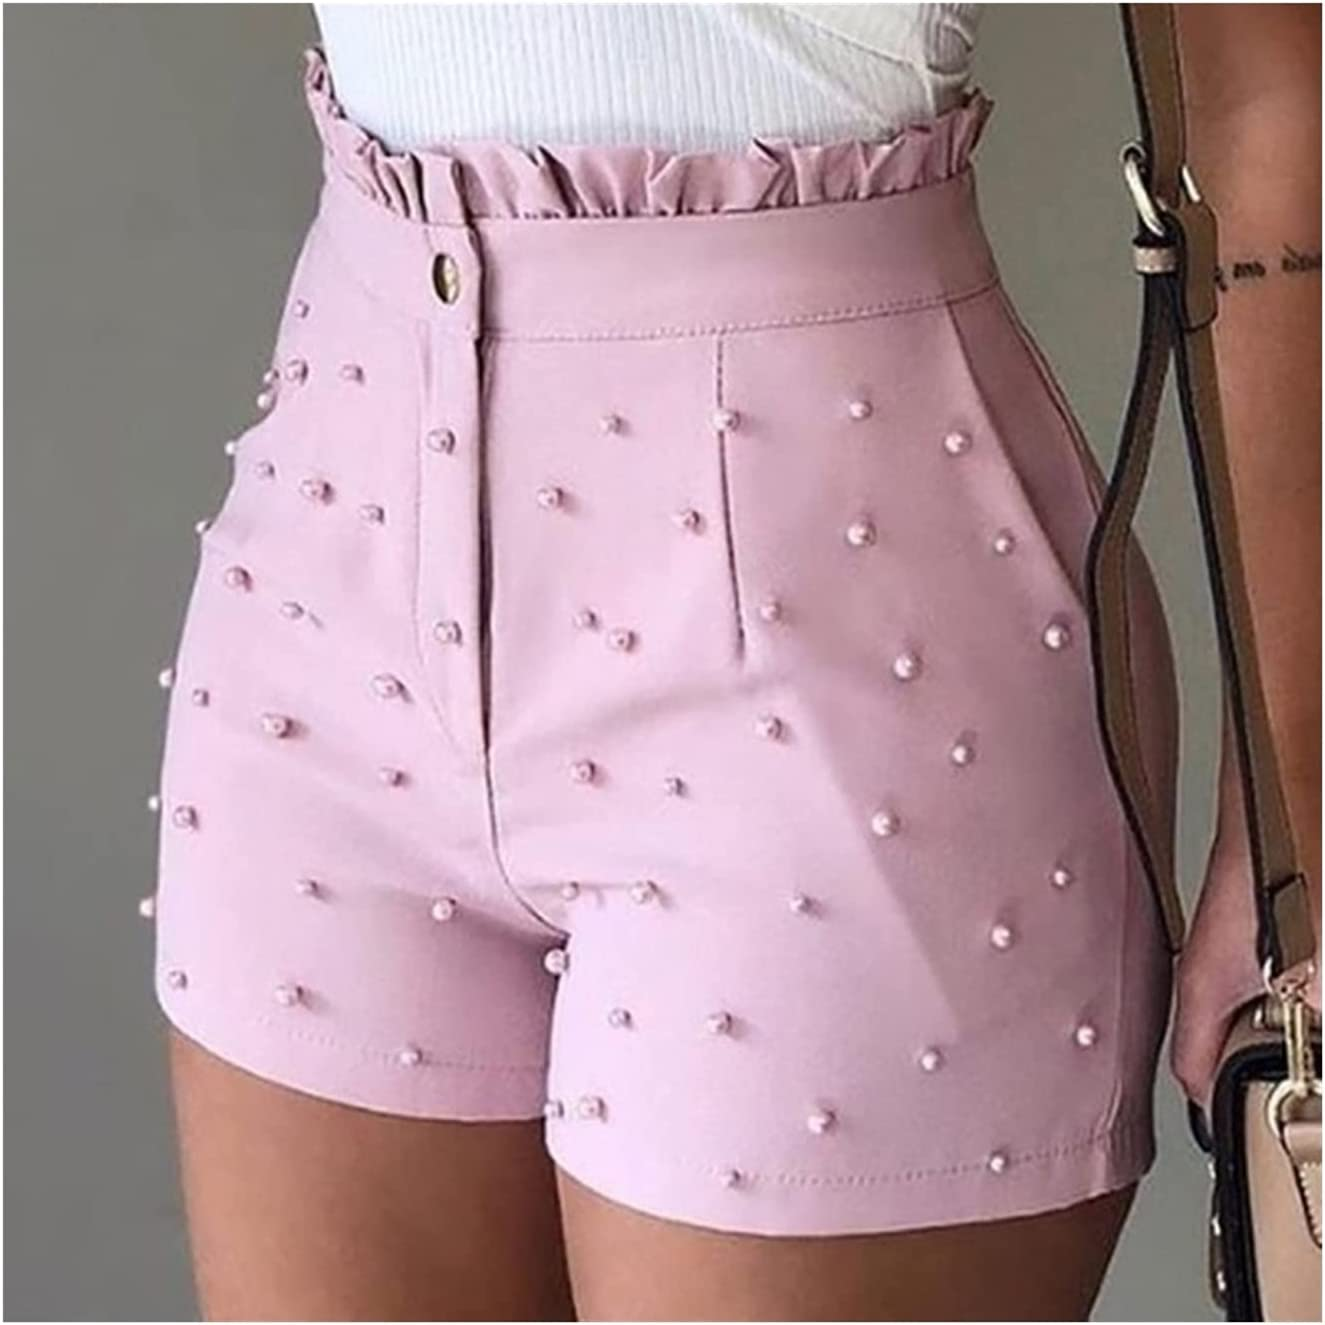 High Waist Button Ruffled Beaded Women Shorts Direct store Limited price sale Ruff Summer